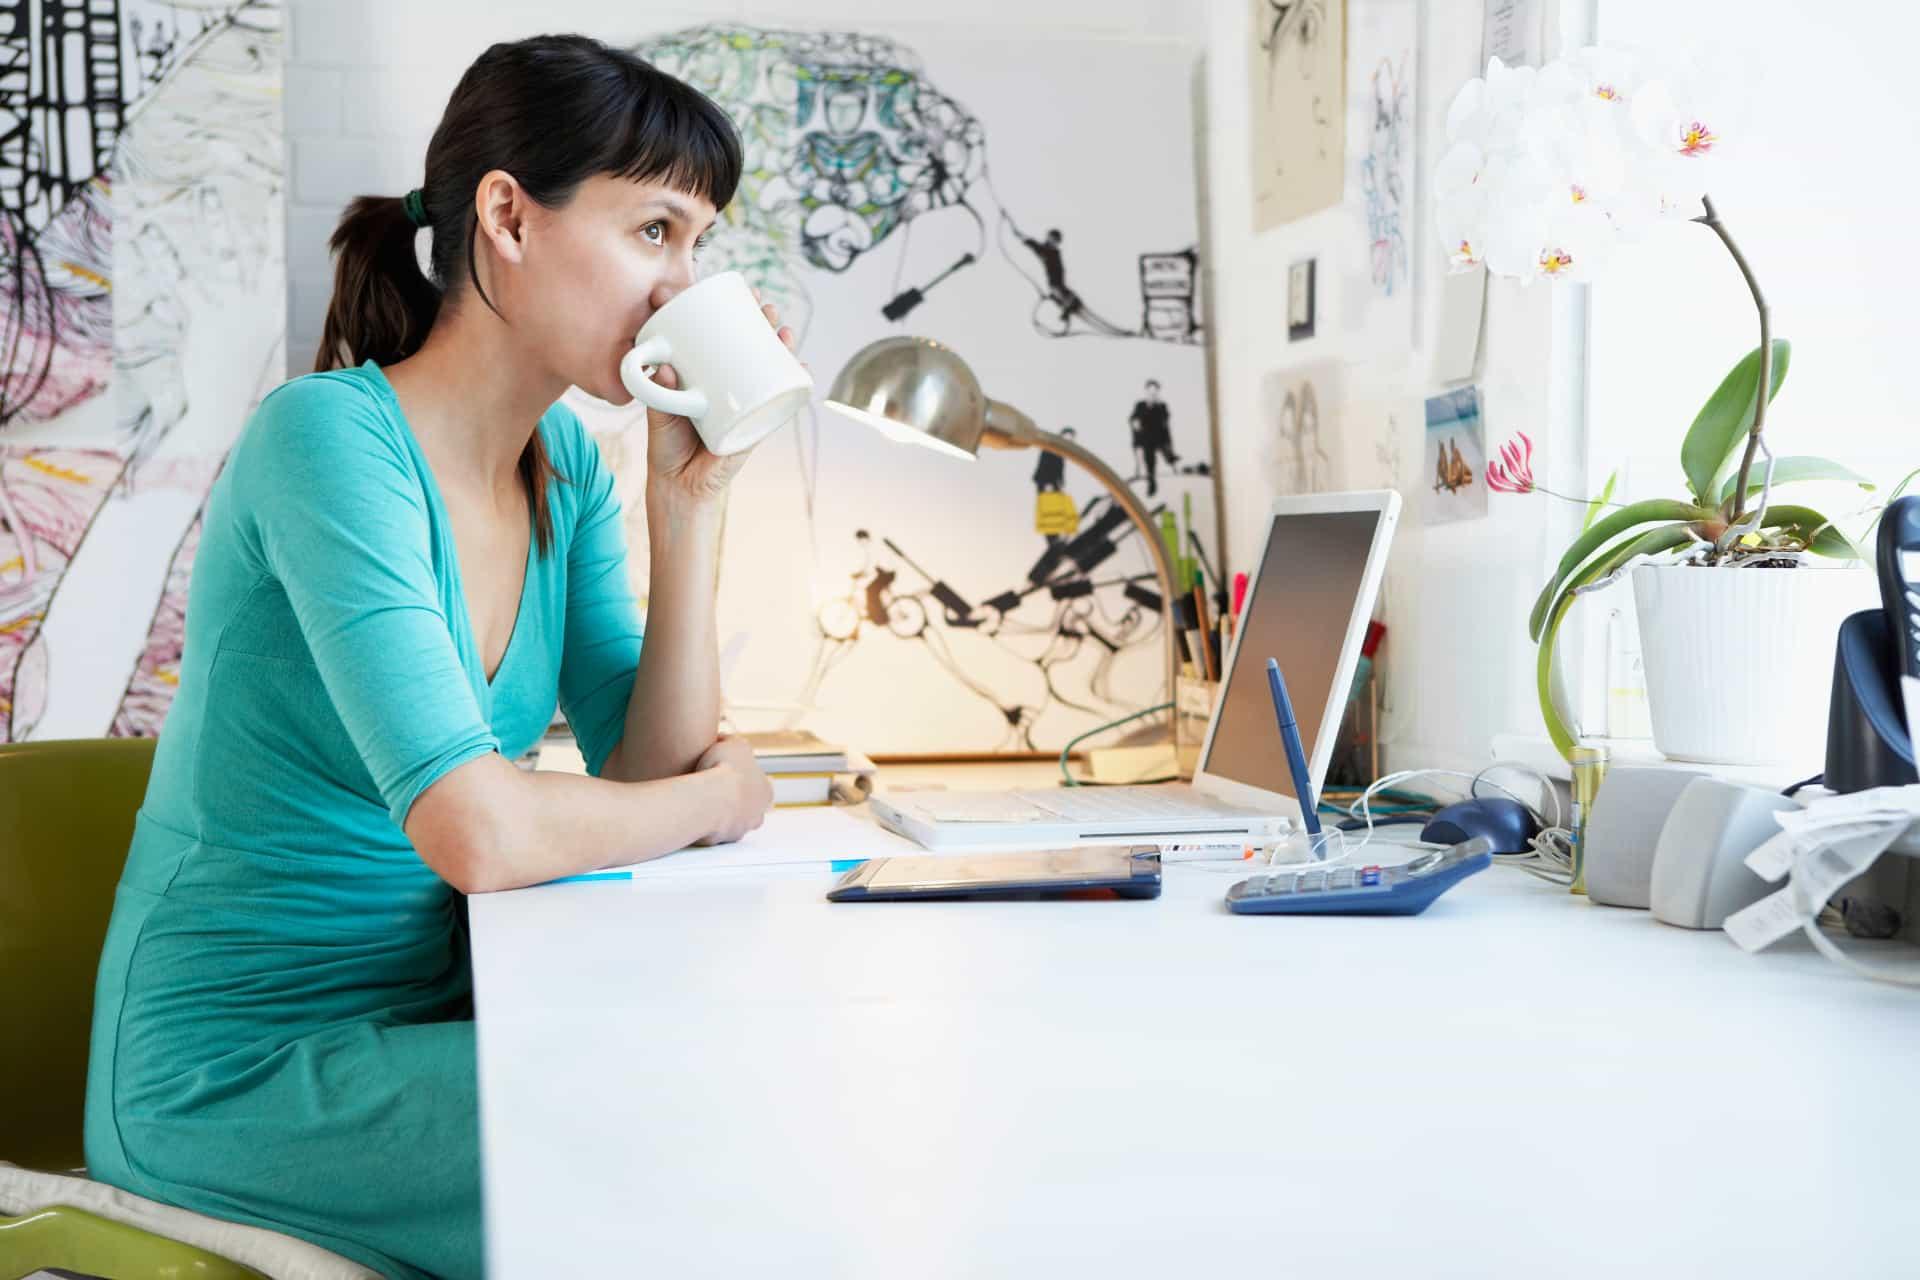 Elegir el mejor coworking